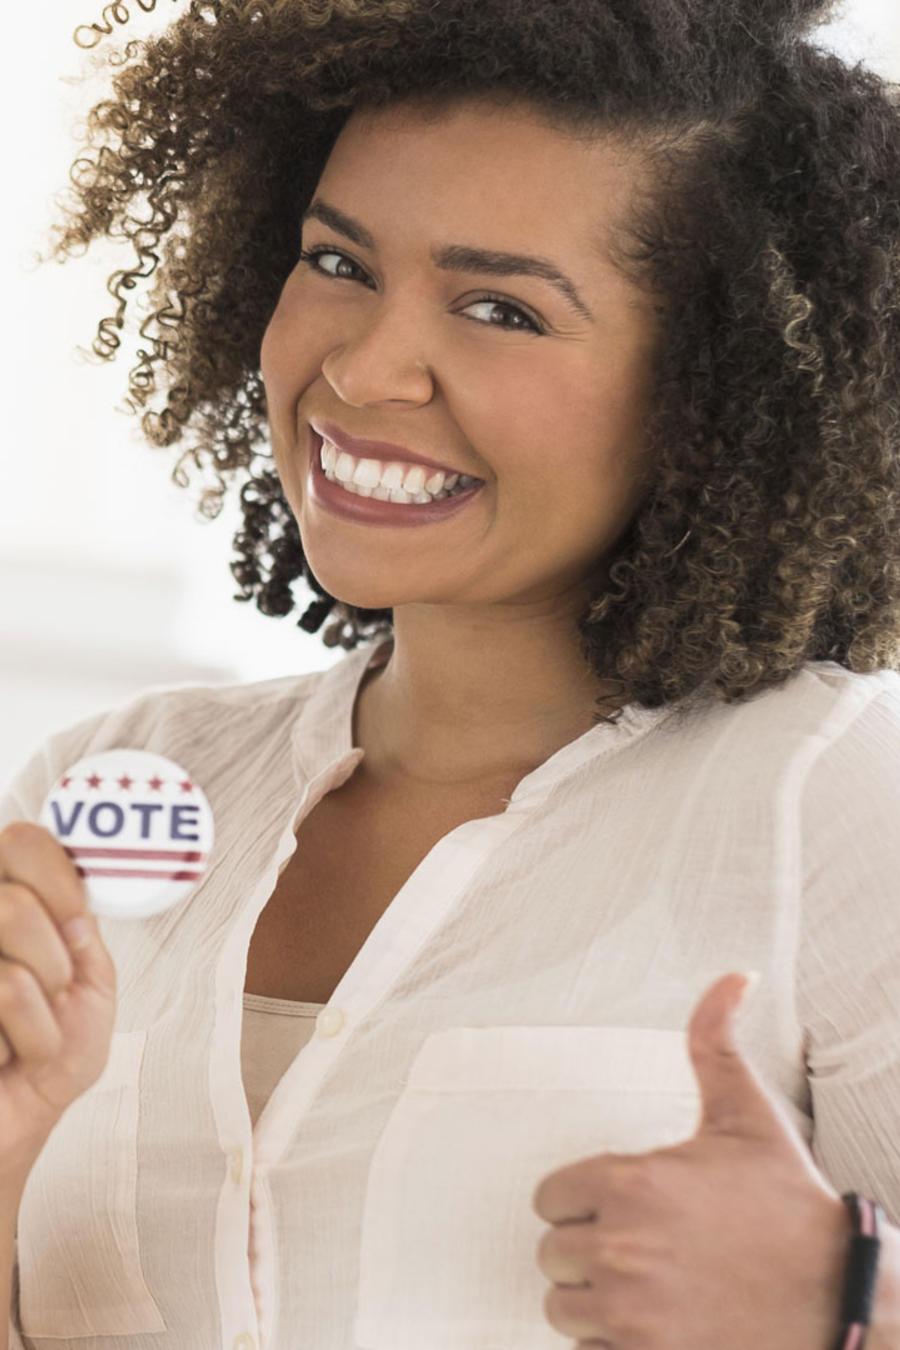 Mujer votante sonriendo